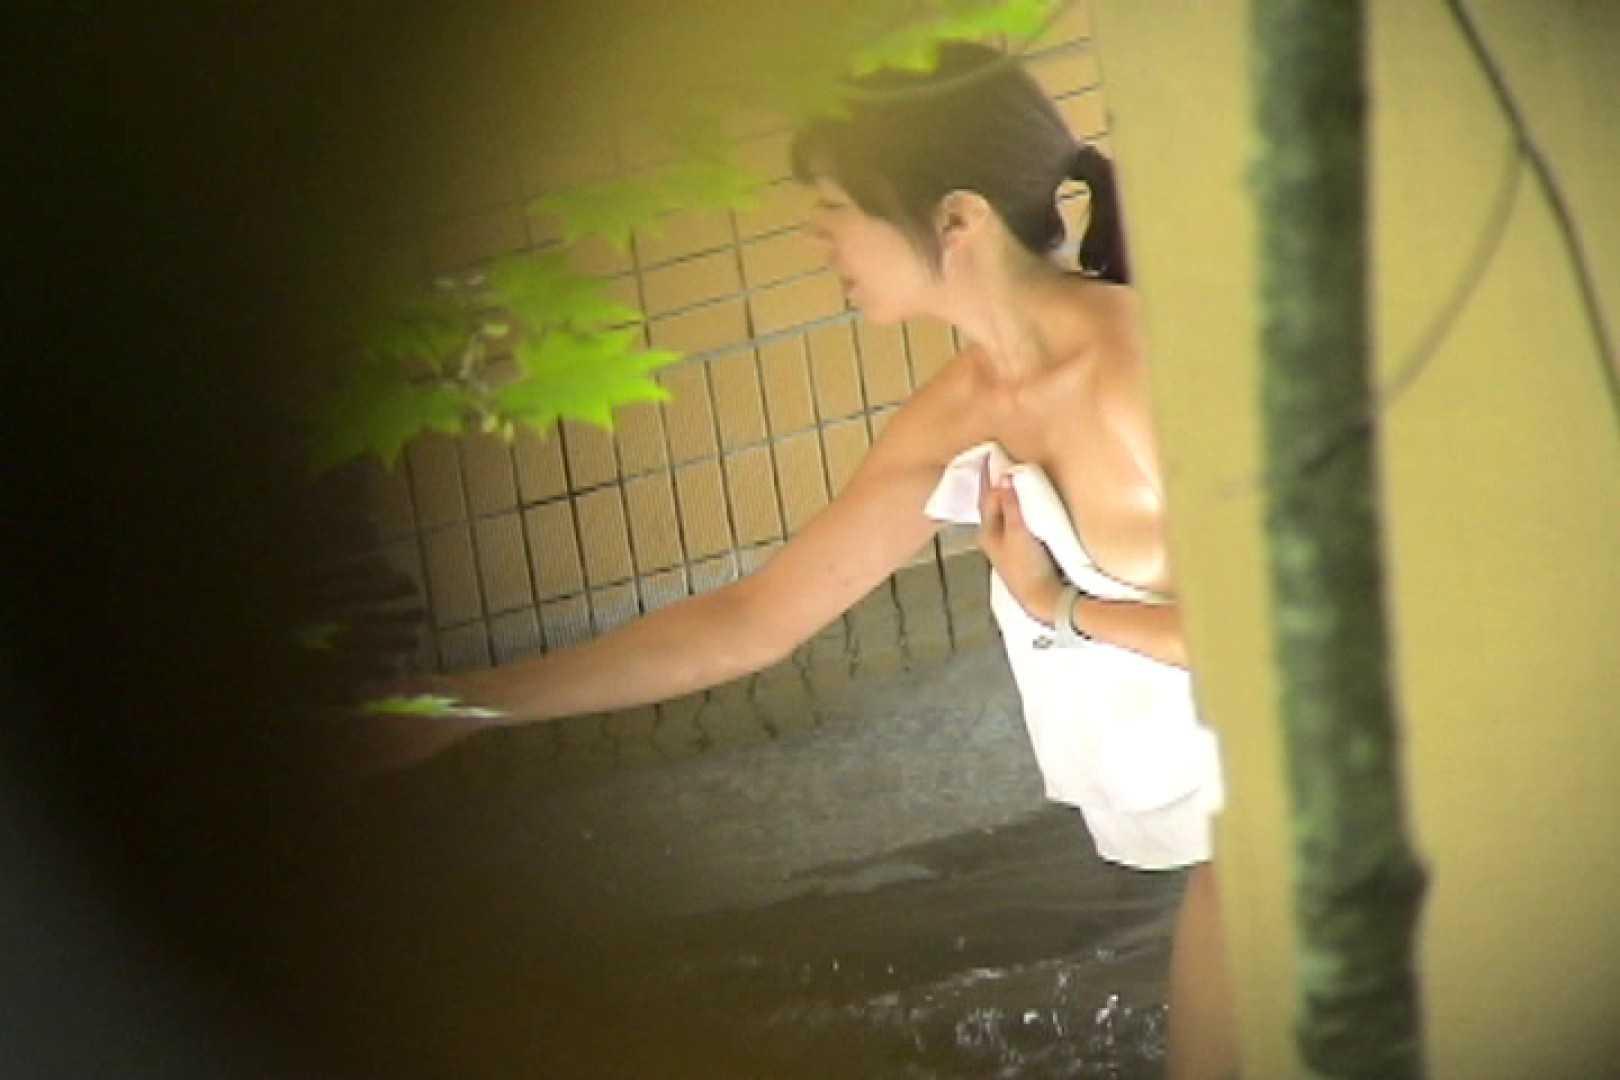 Aquaな露天風呂Vol.703 露天風呂突入 おめこ無修正画像 93pic 32